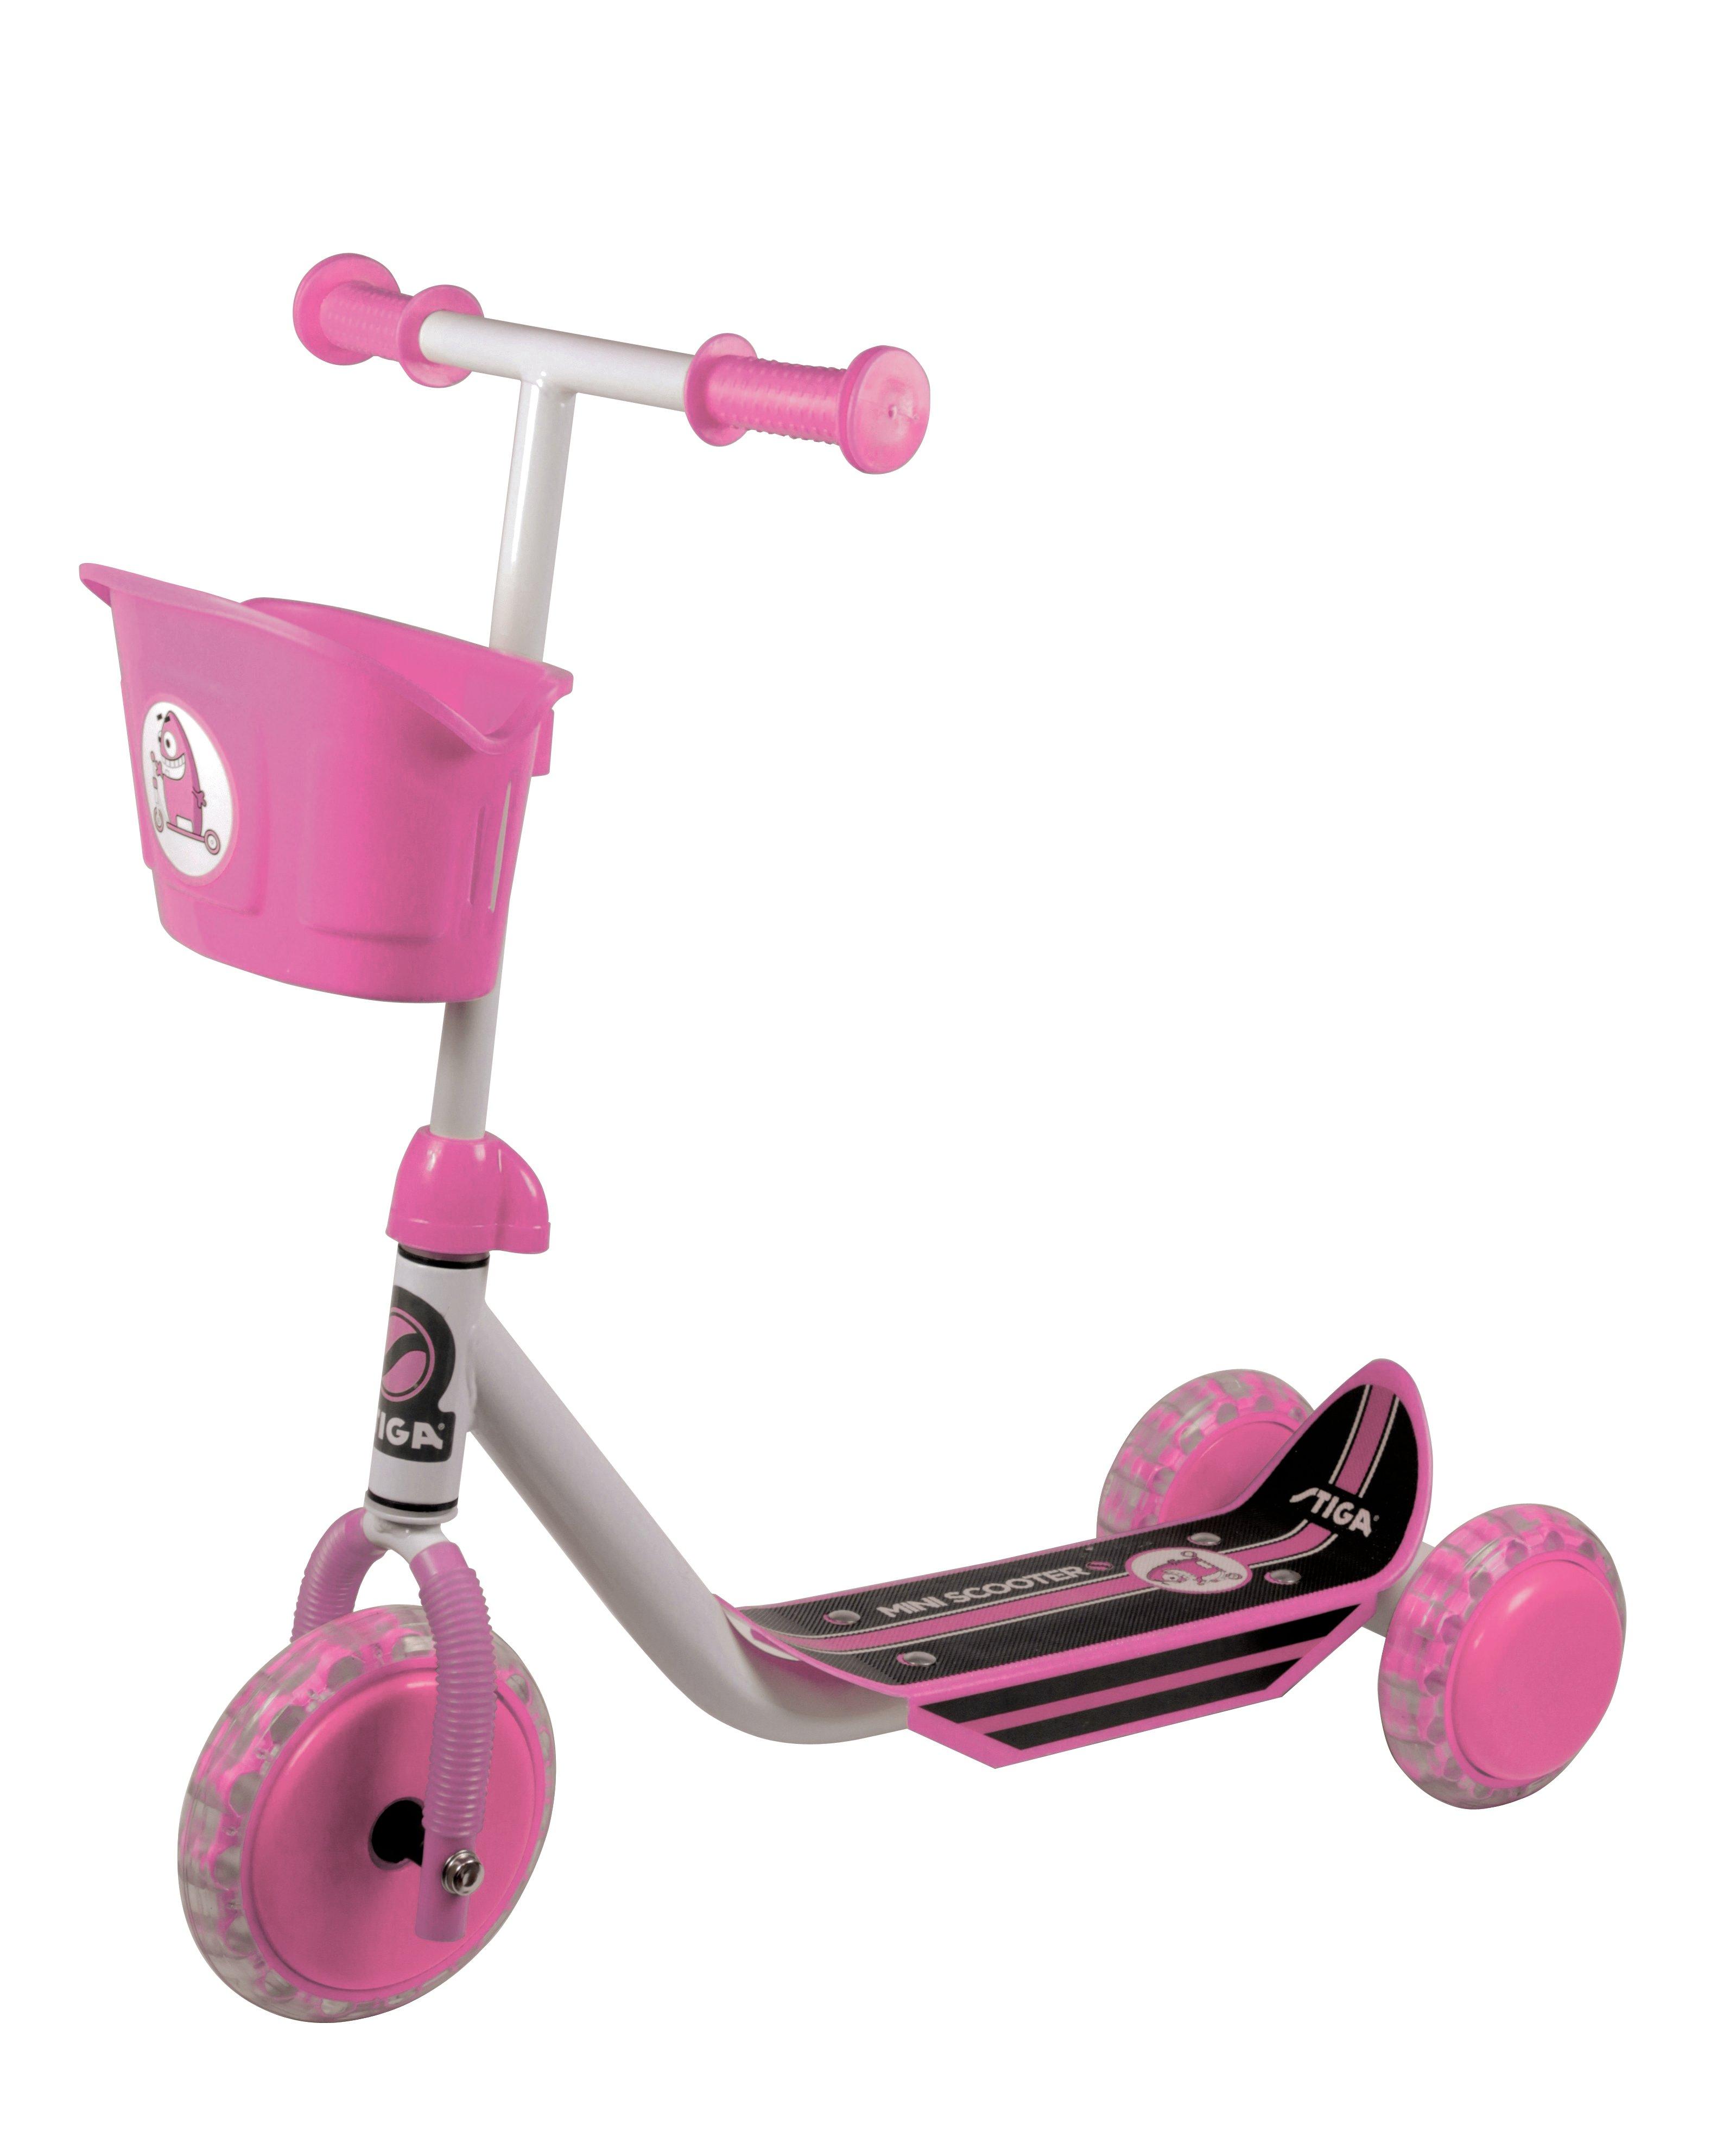 Stiga - Kid 3W Scooter - Rose (80-7401-07)